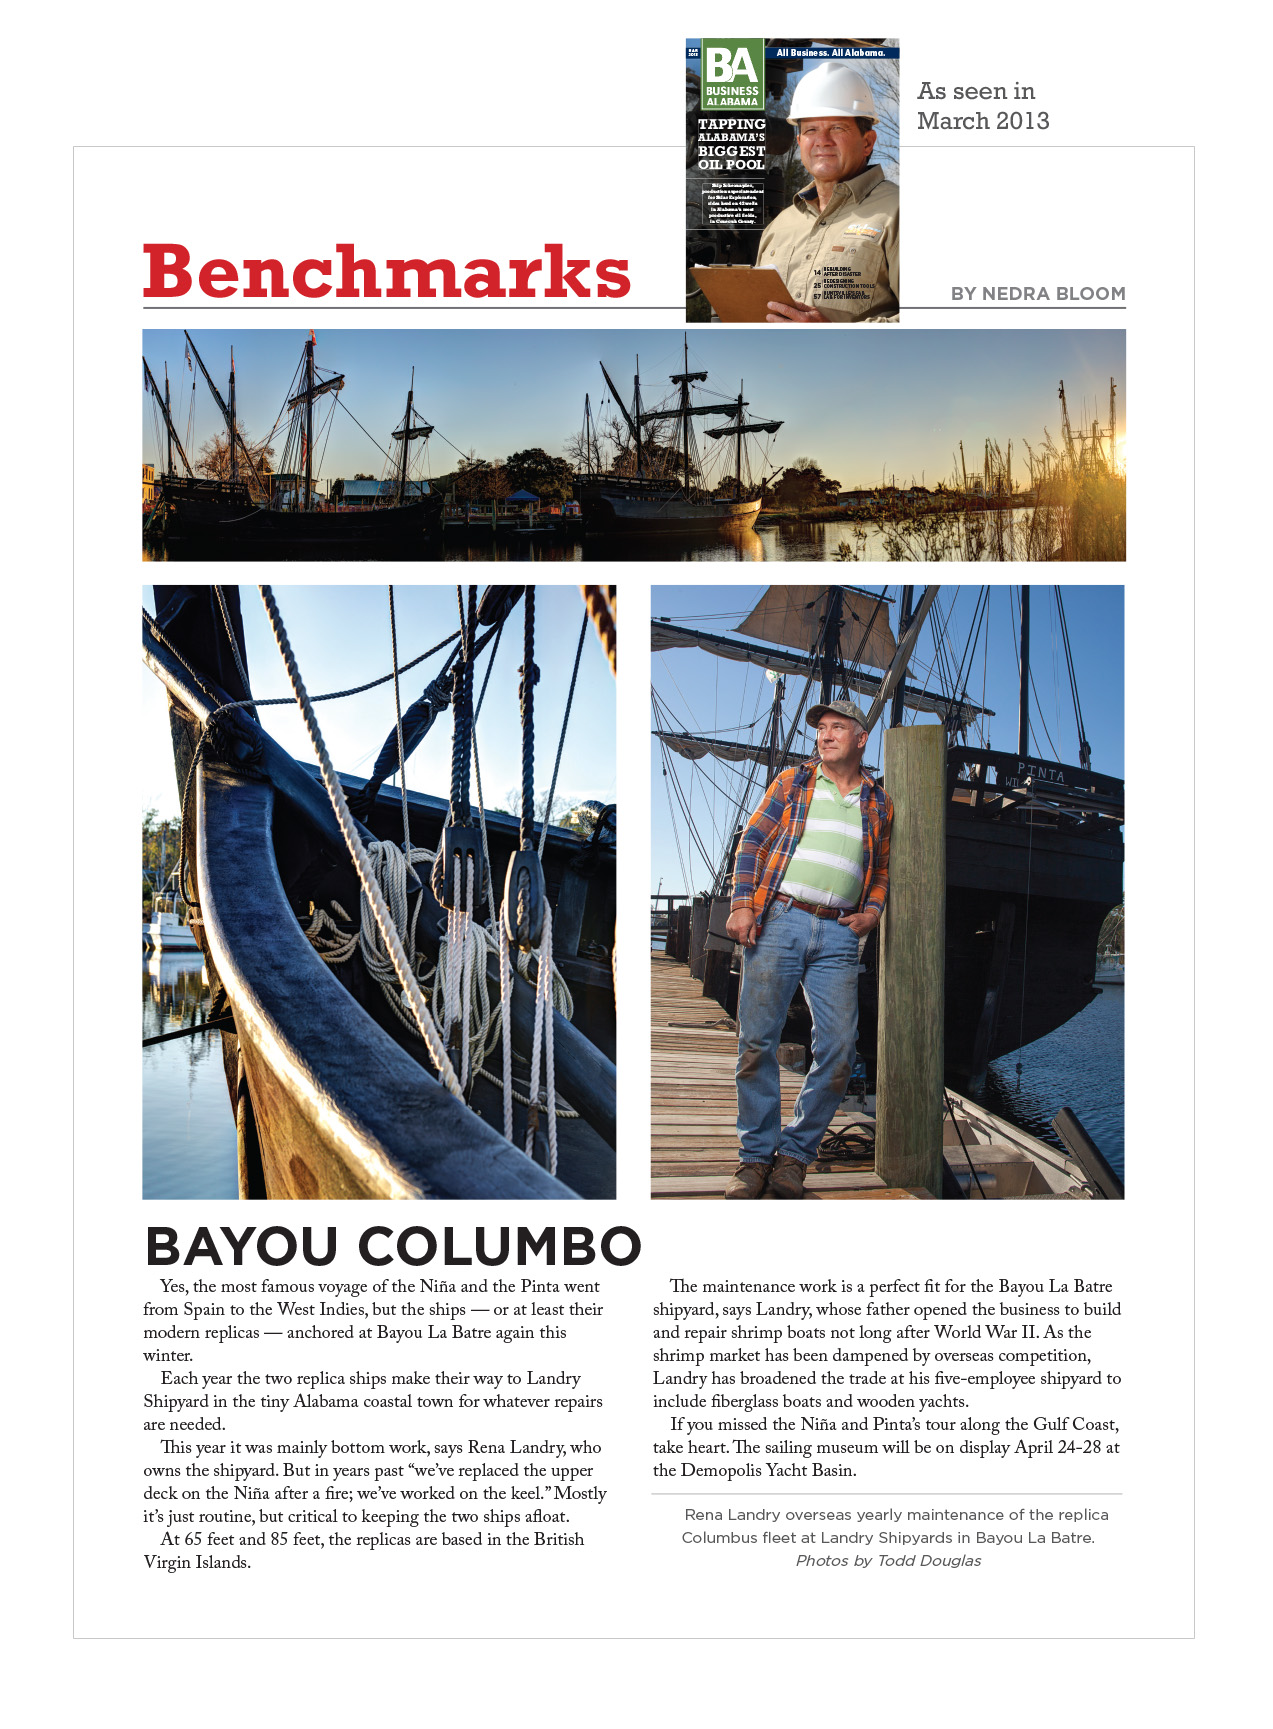 BA_Rena_Landry_Bayou_Ships.jpg